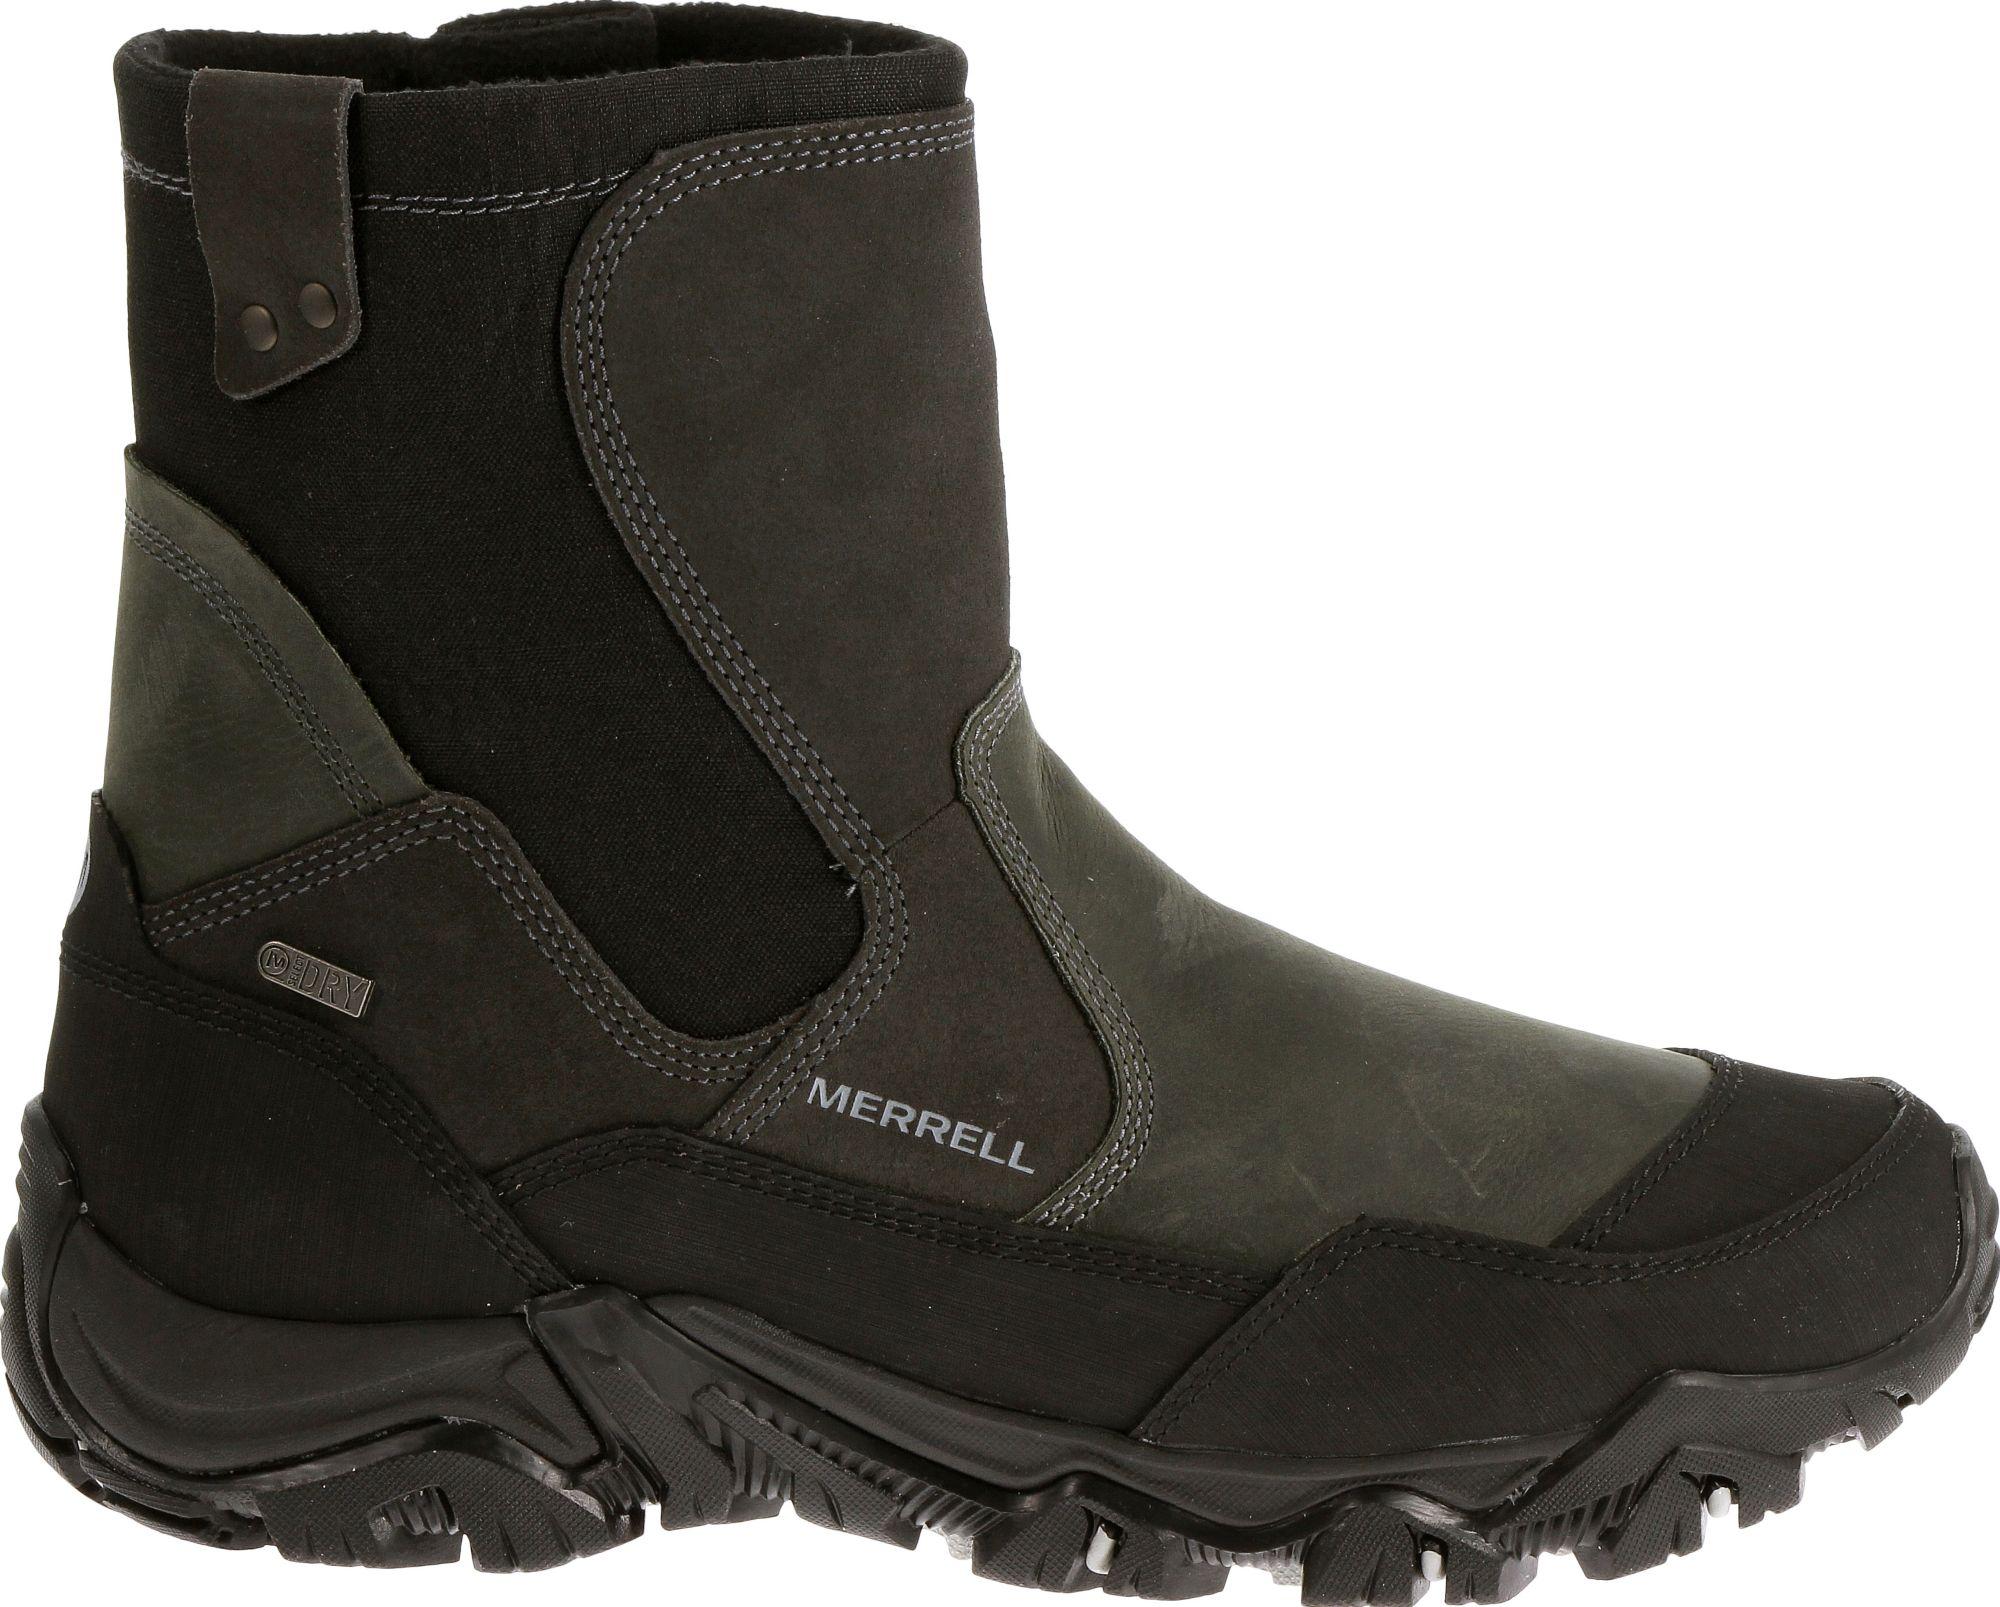 Mens Winter Boots DICKS Sporting Goods